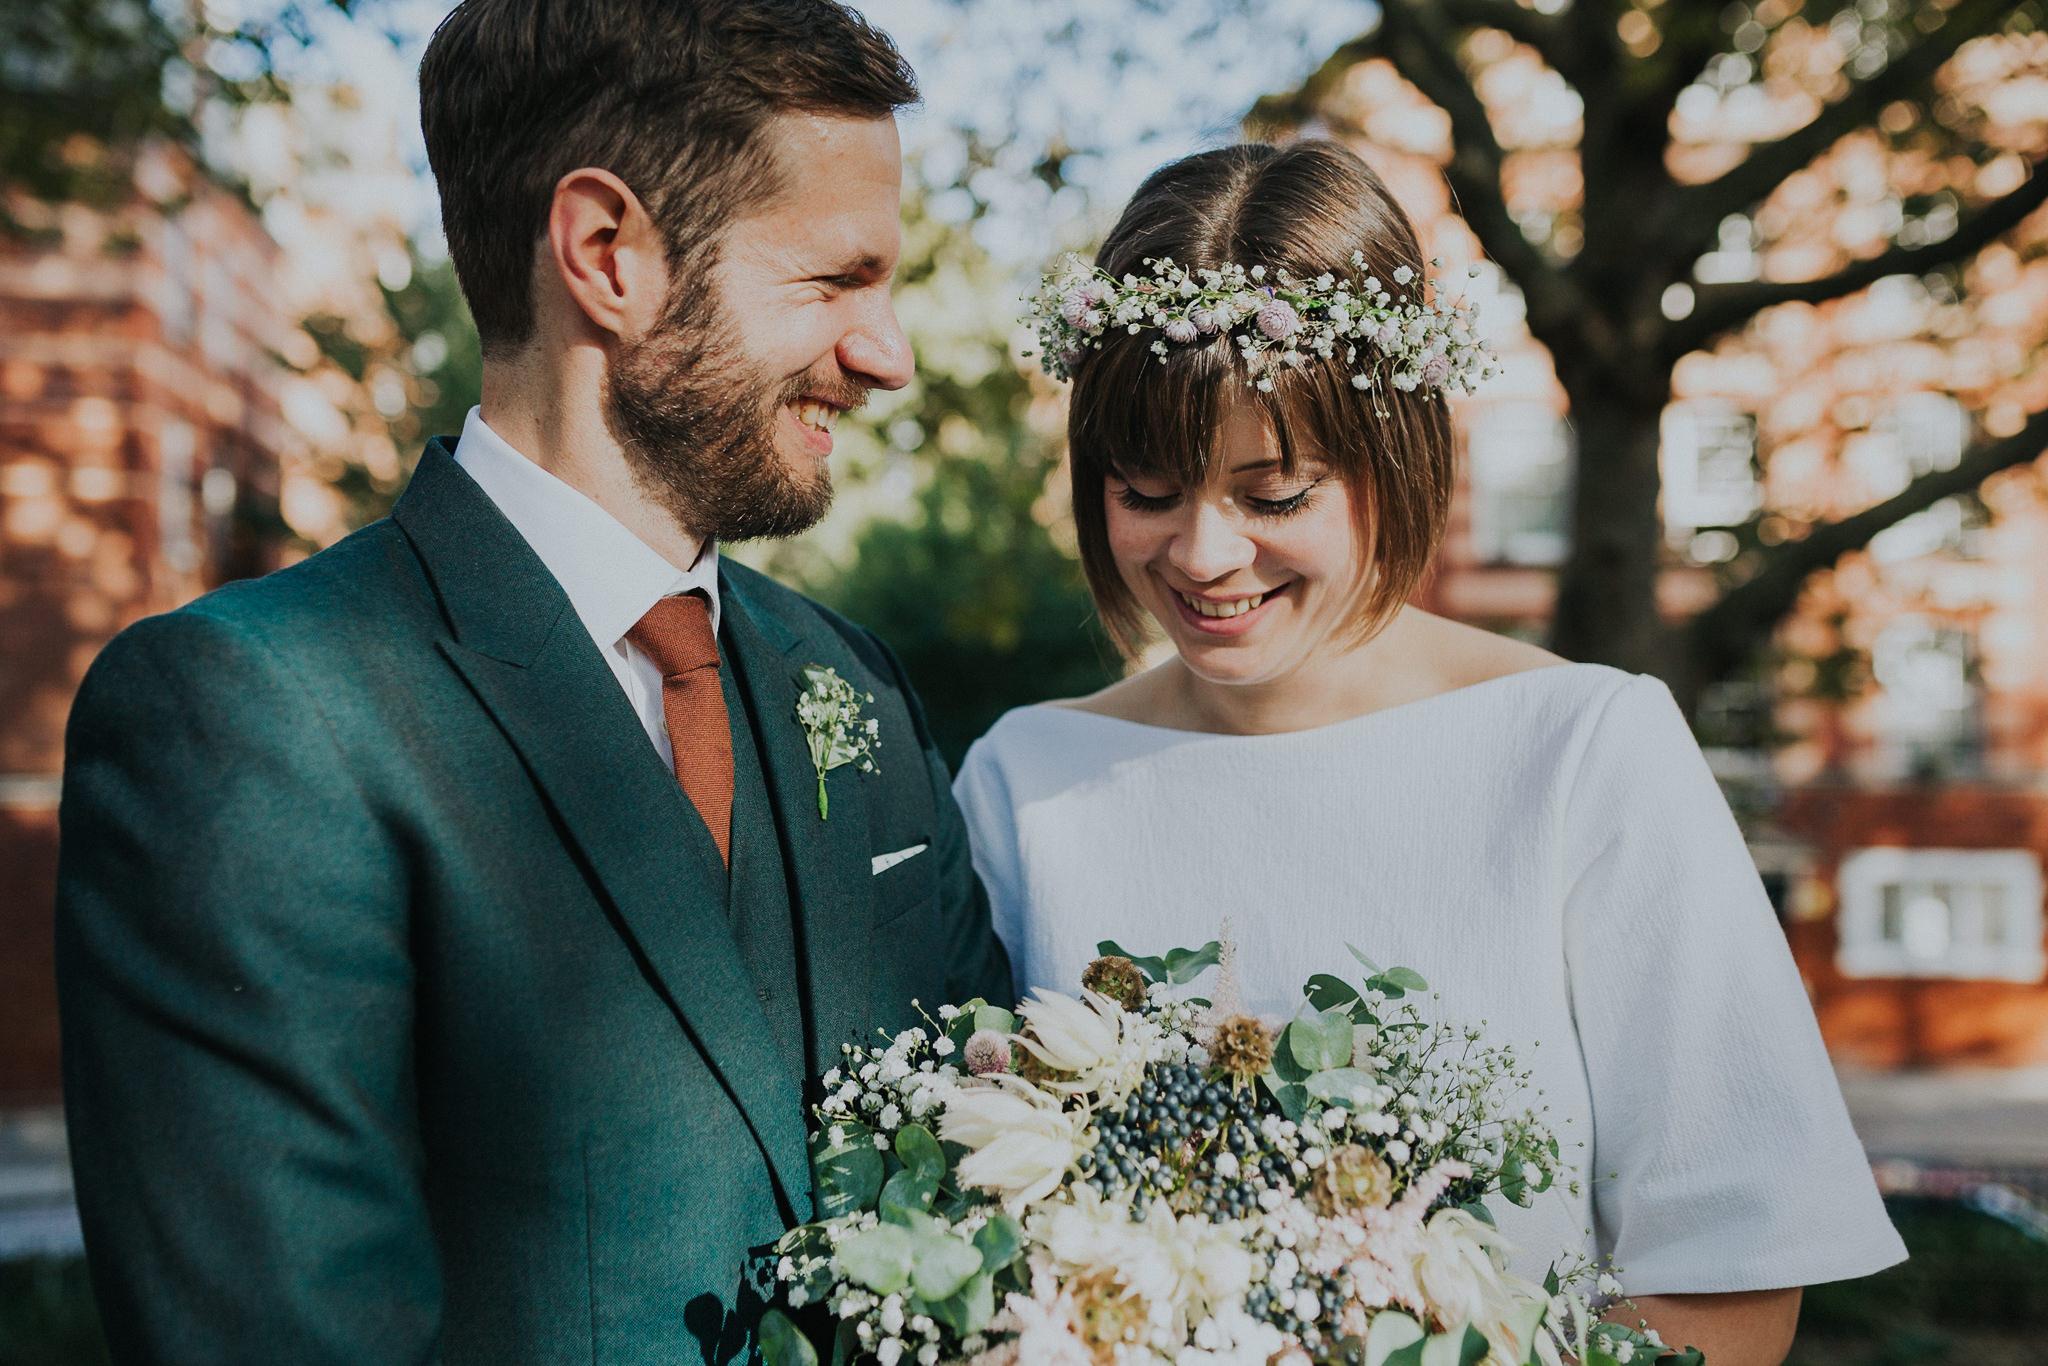 kate-gray-london-wedding-photography-51.jpg